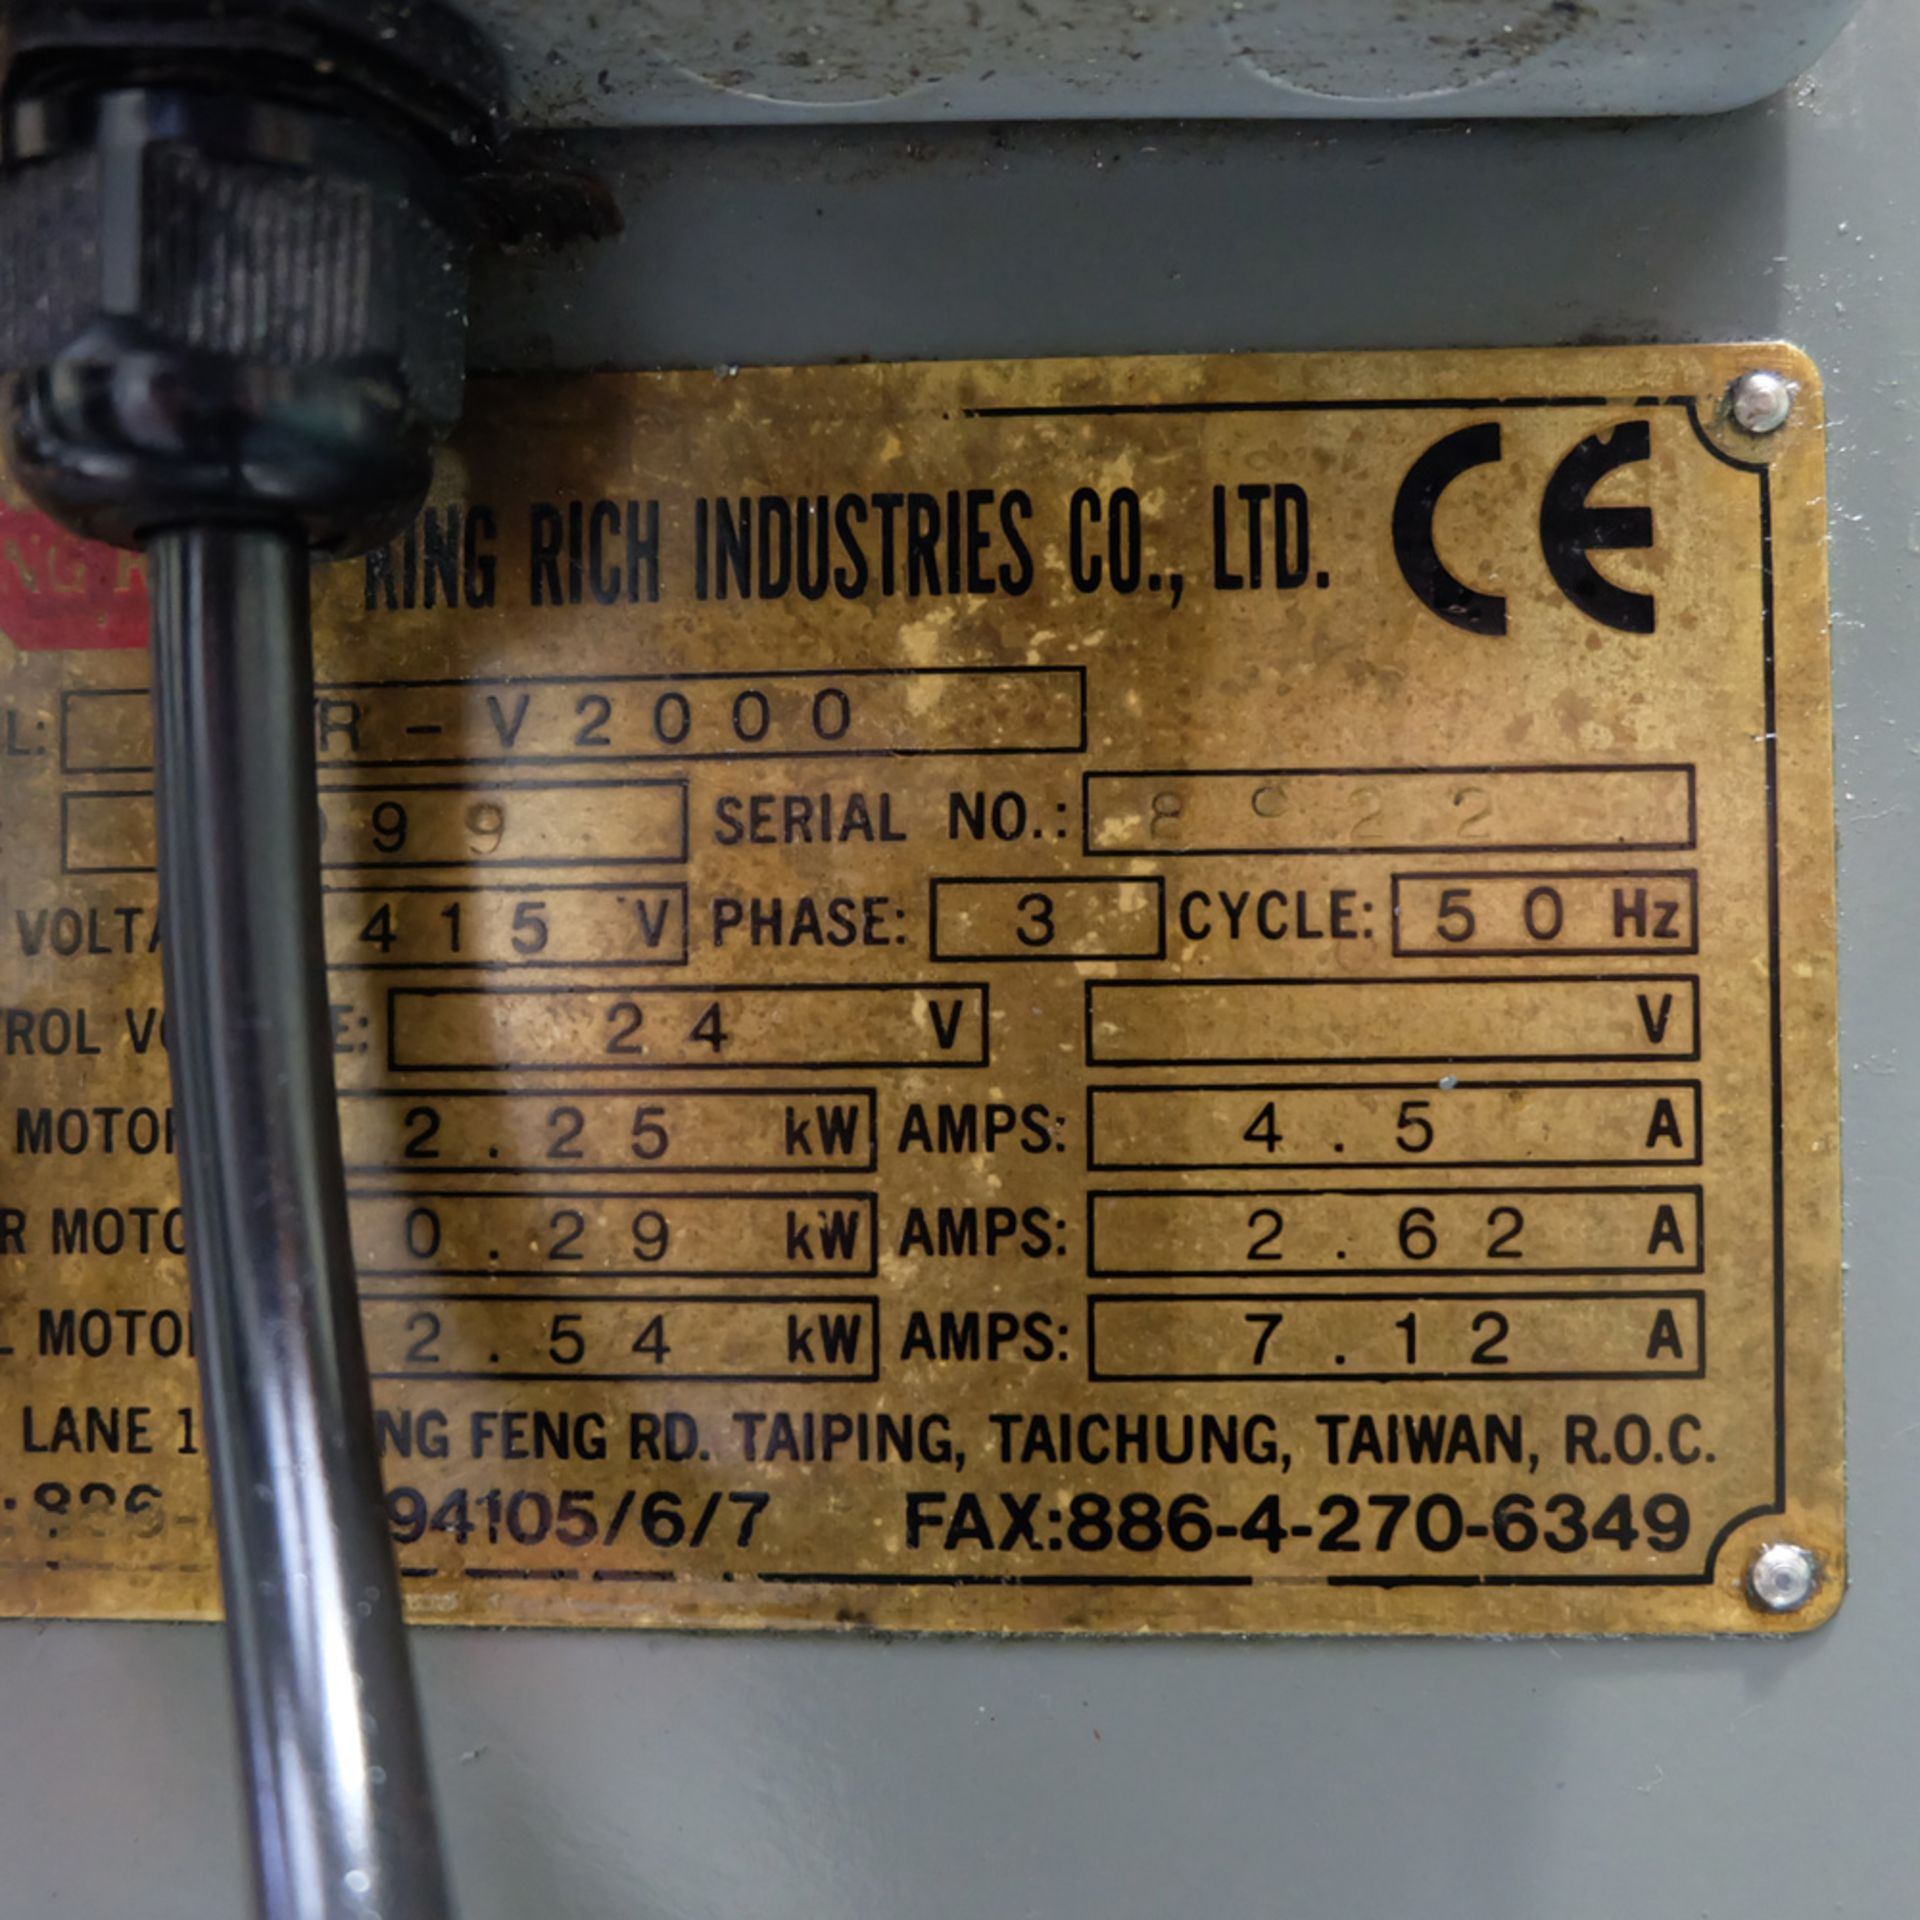 KRV Pro 2000: Turret Milling Machine. - Image 11 of 11